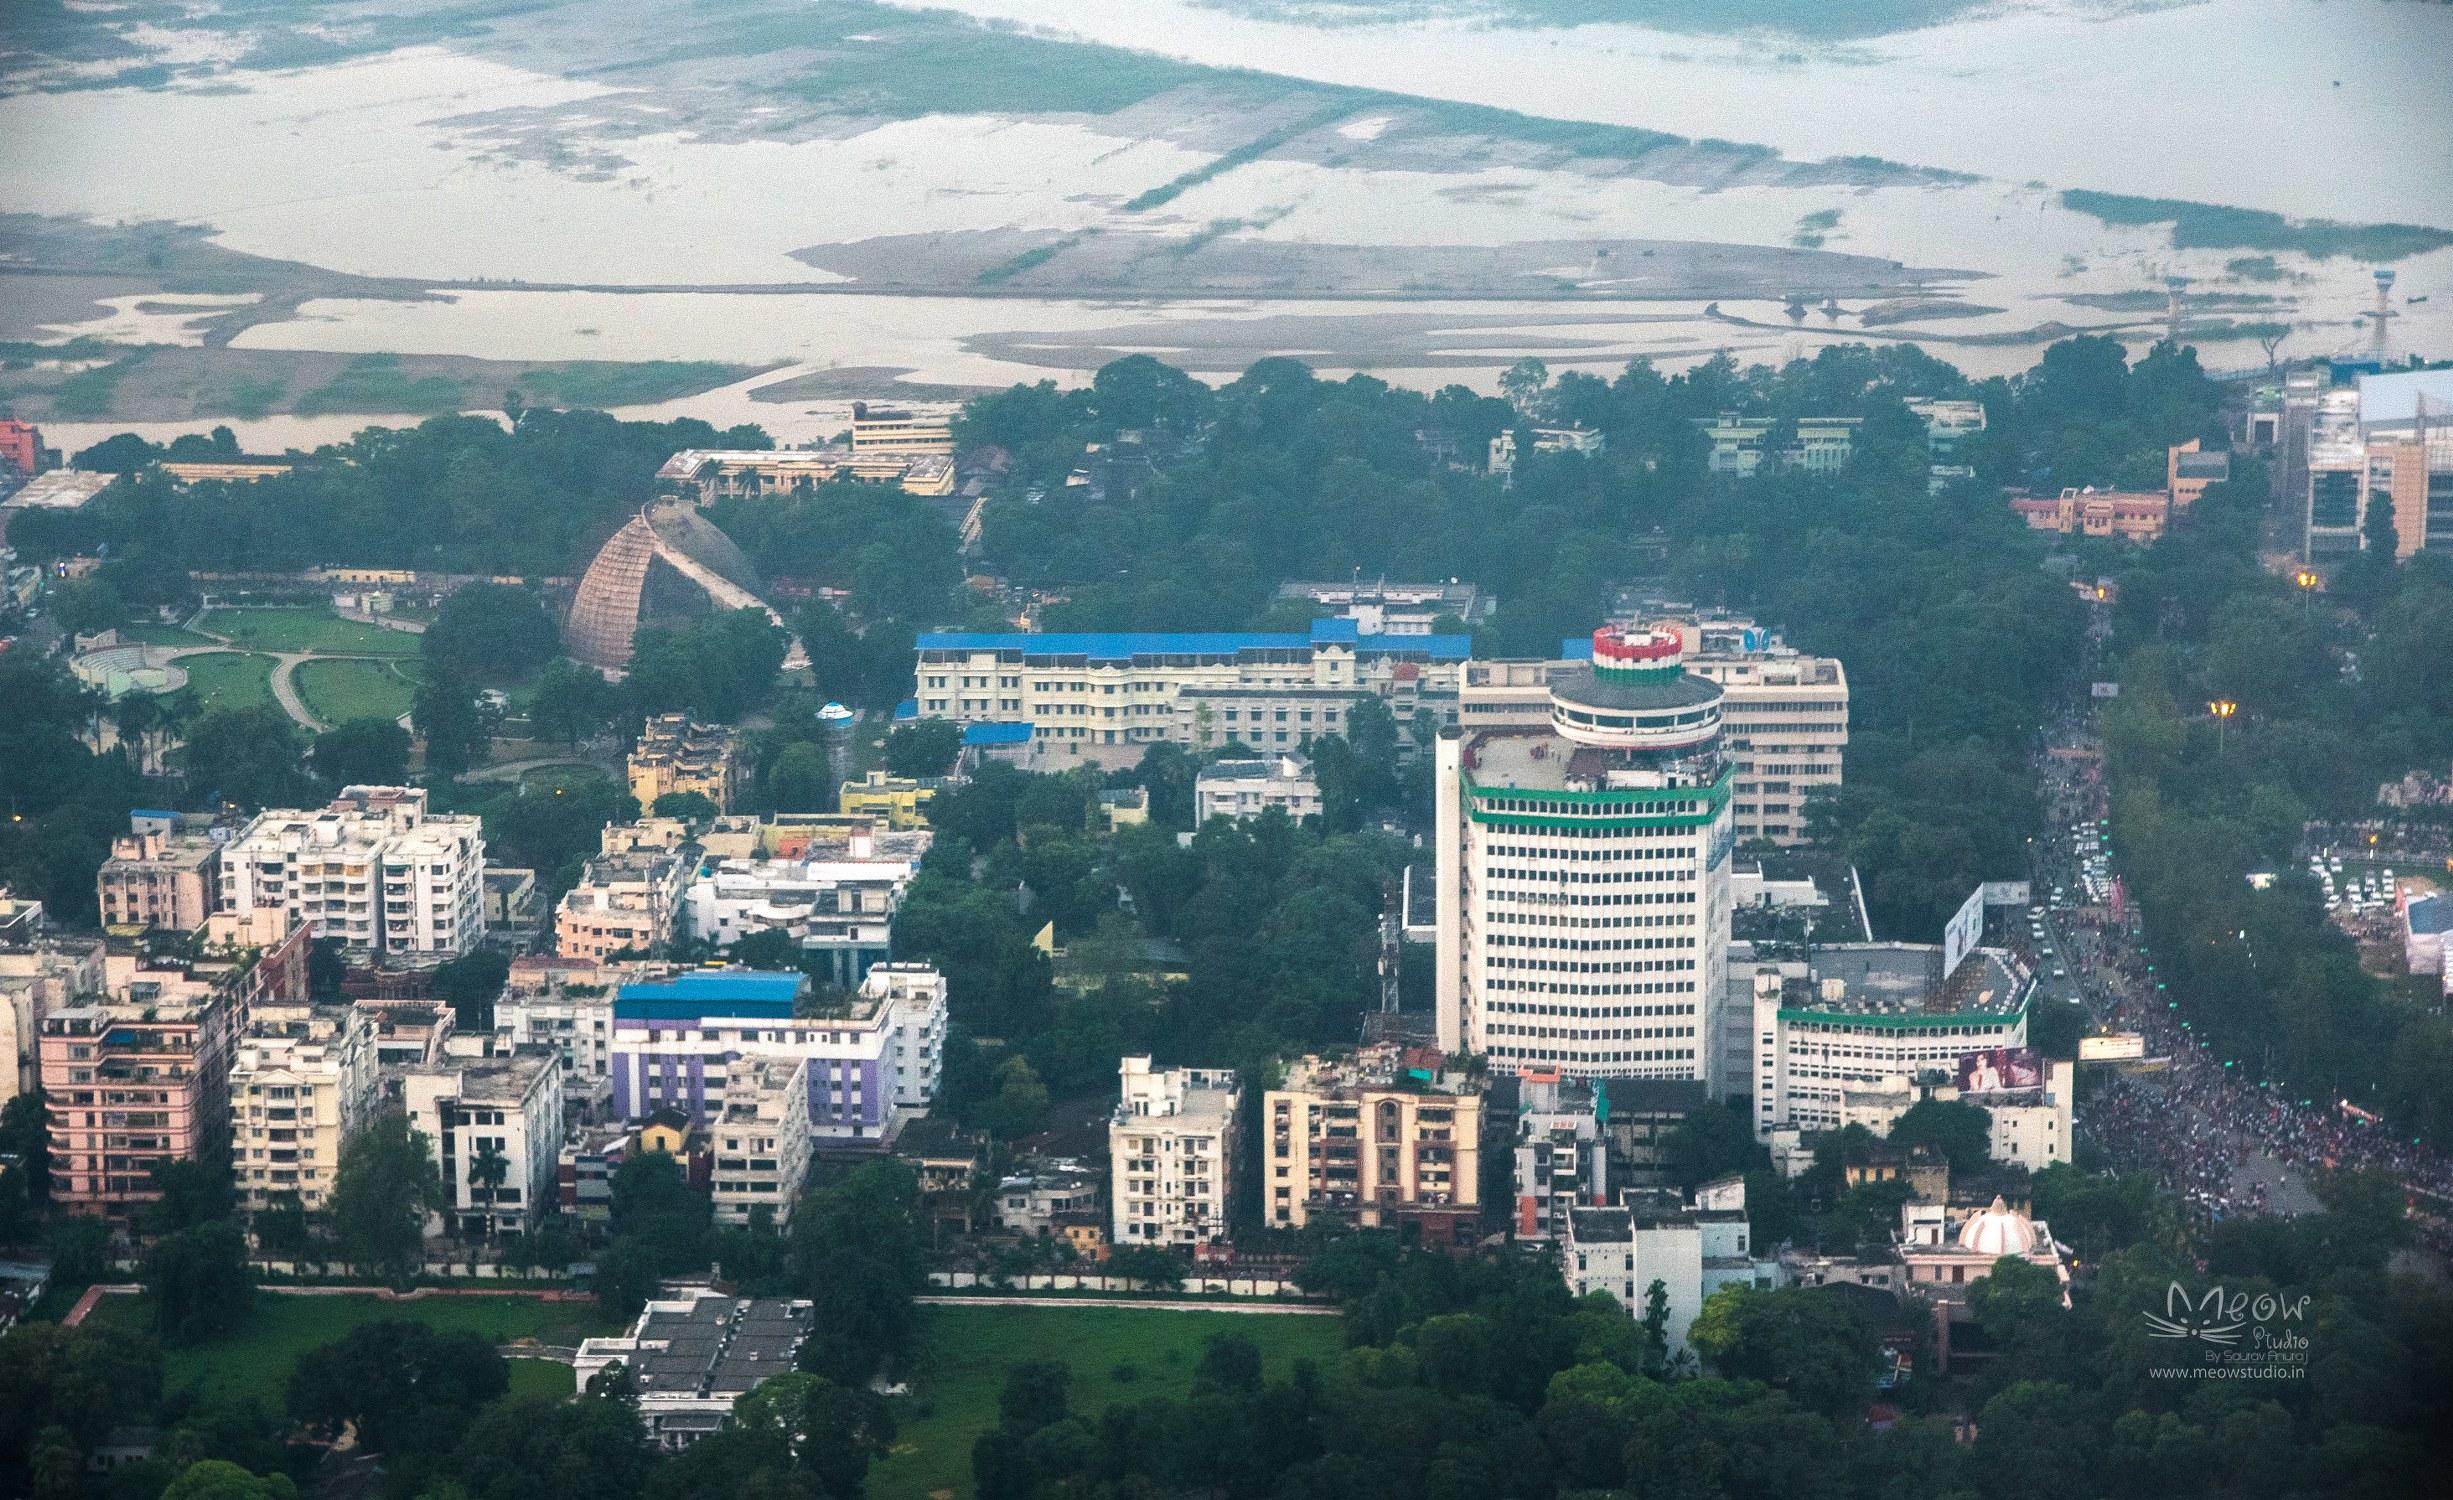 Photos from the Sky | Bird's Eye View of Patna by Saurav Anuraj